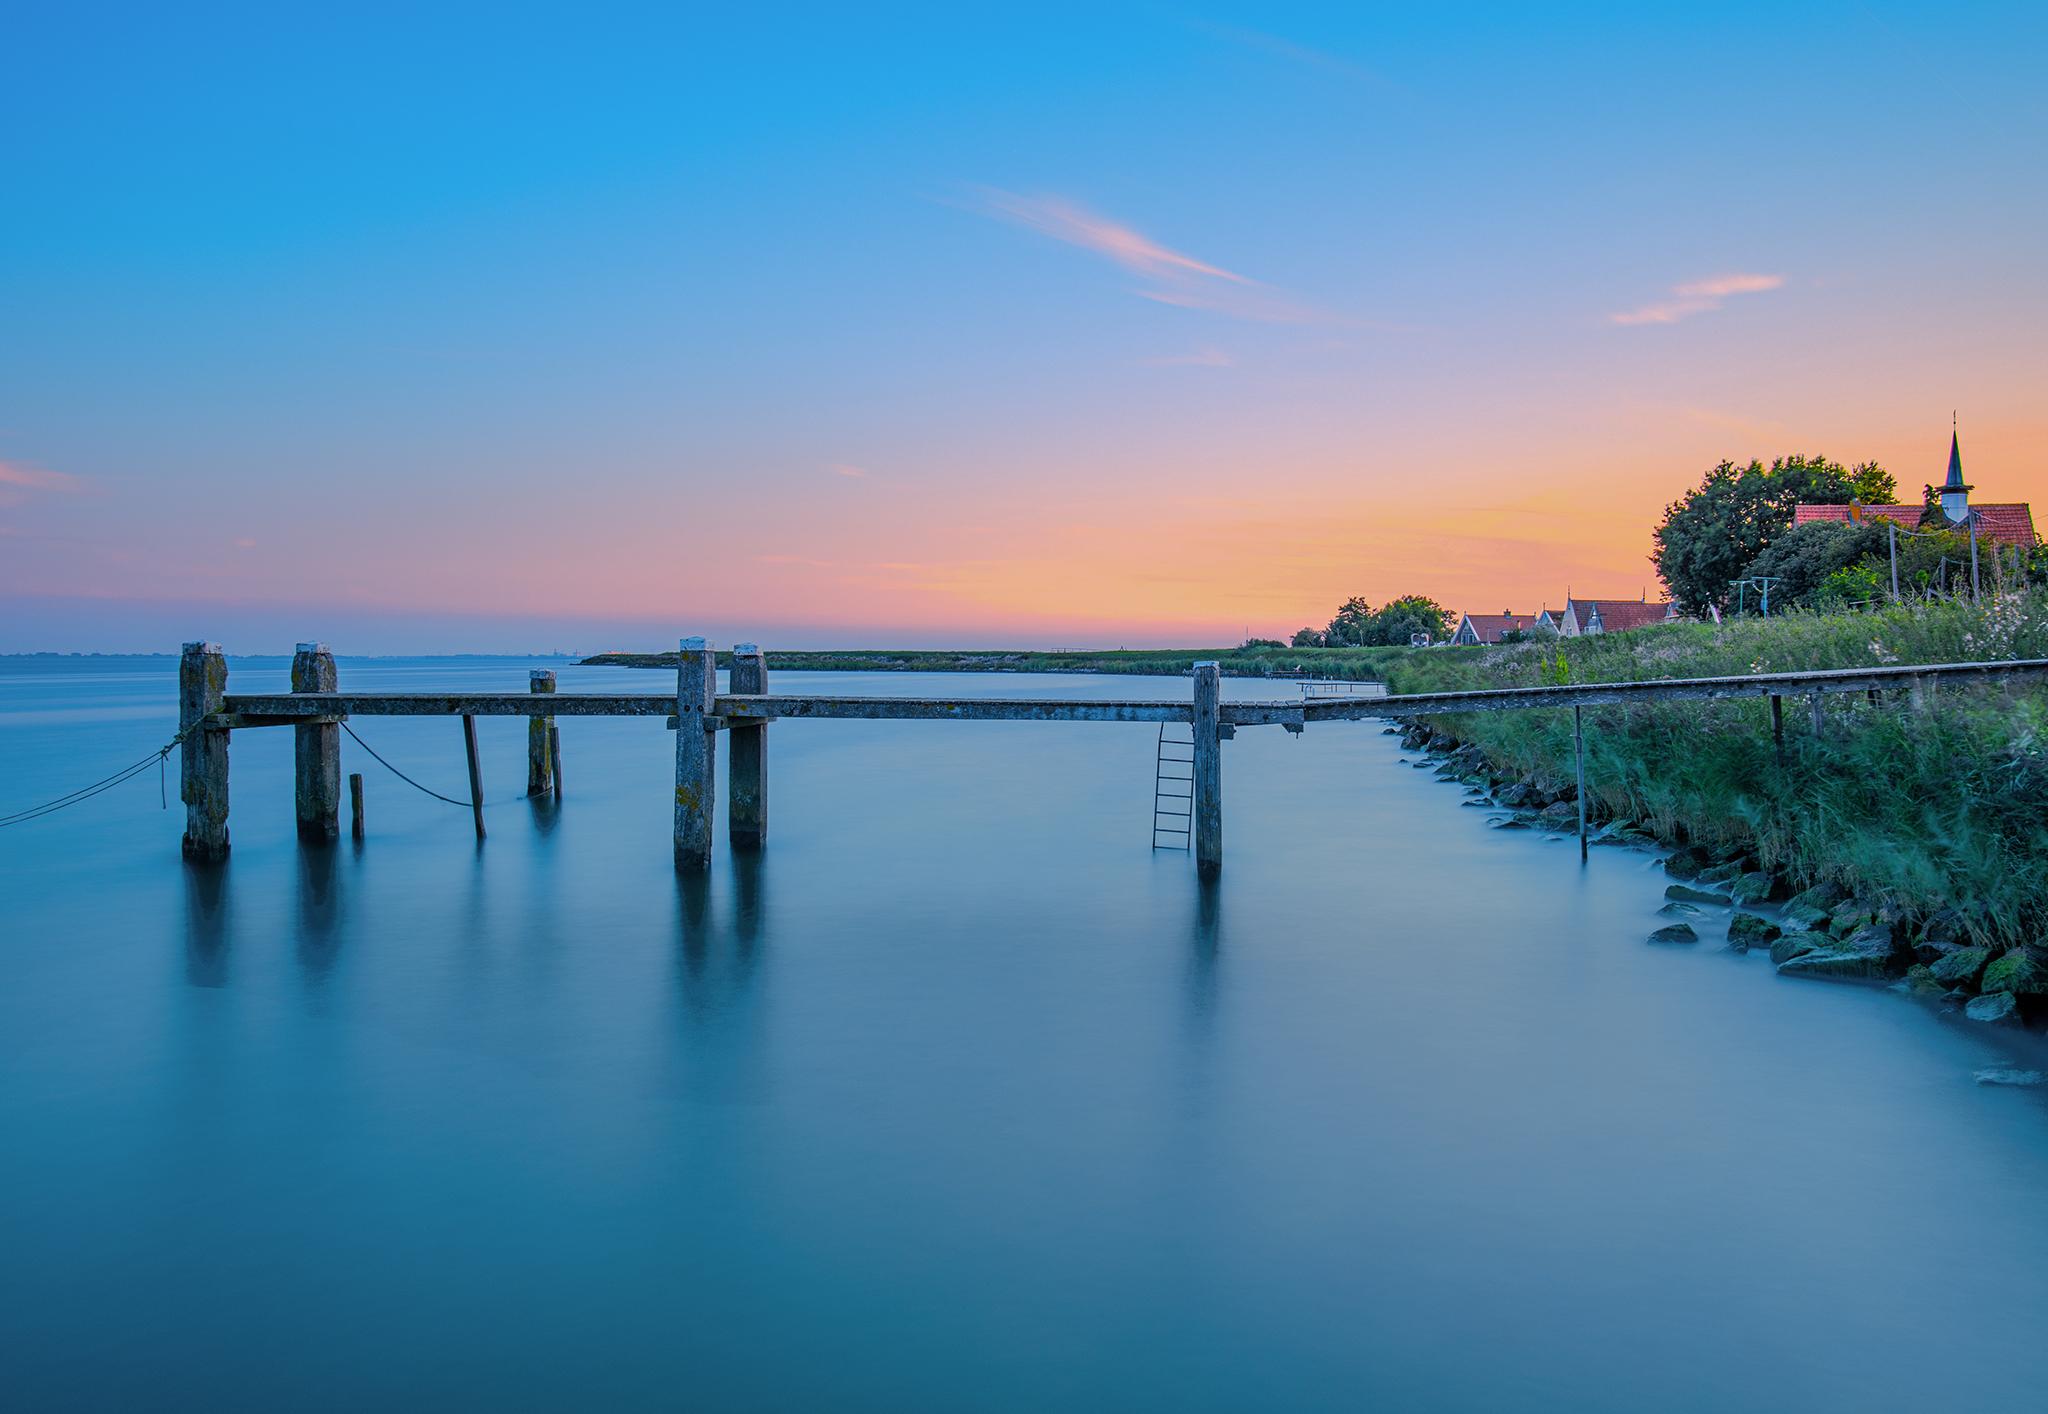 Soft sunset on Markermeer, Netherlands